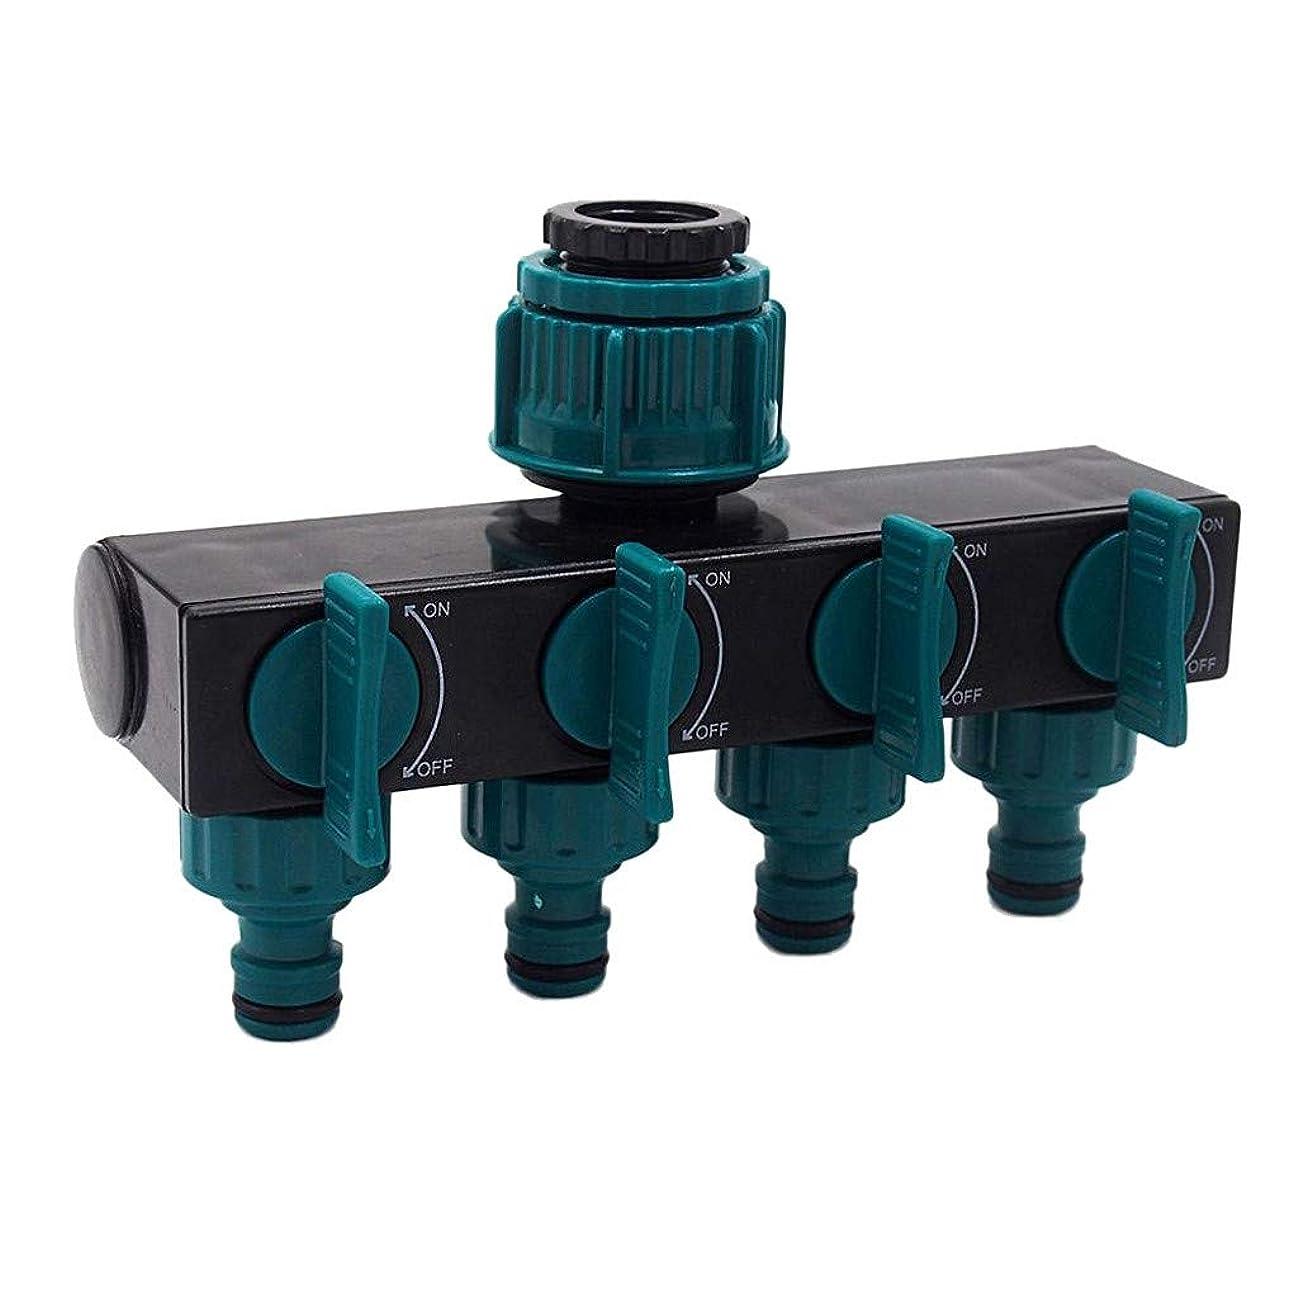 Ktyssp Garden Hose Splitter 4 Way Plastic Tap Hose Connectors Water Distributor hqtle432239